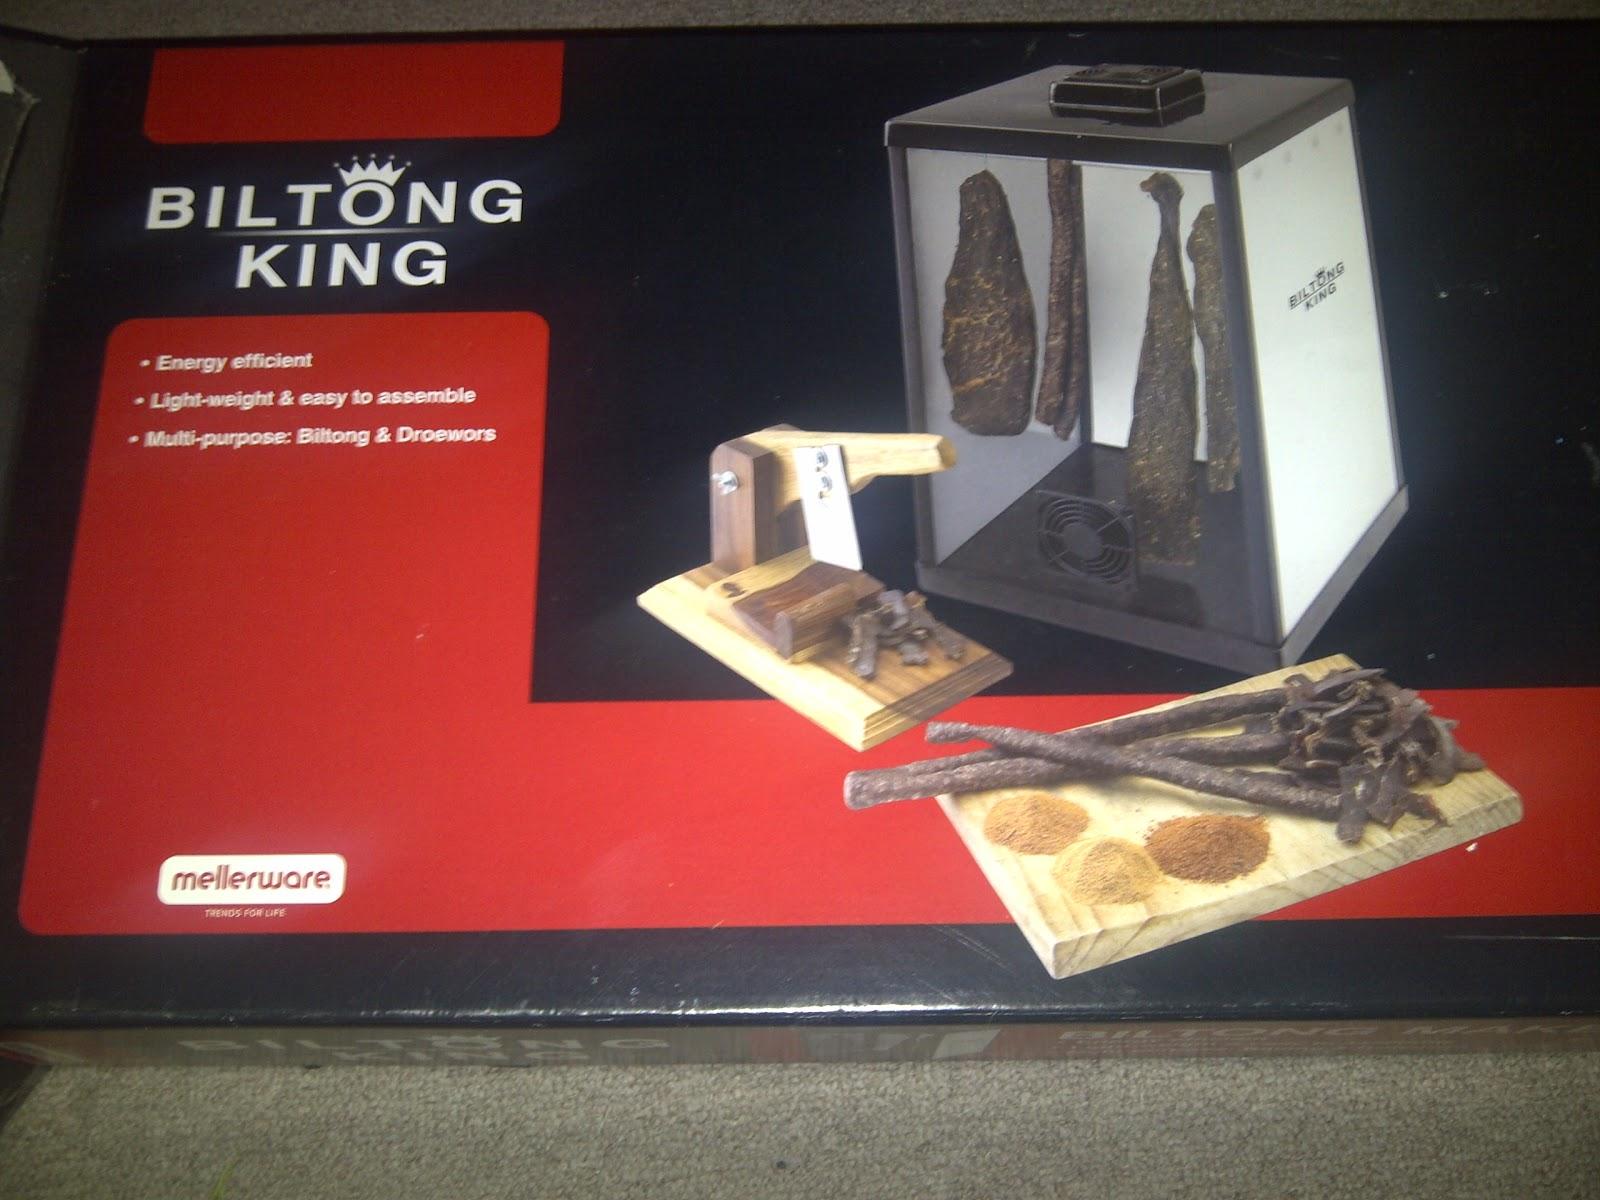 how to make biltong without a biltong maker